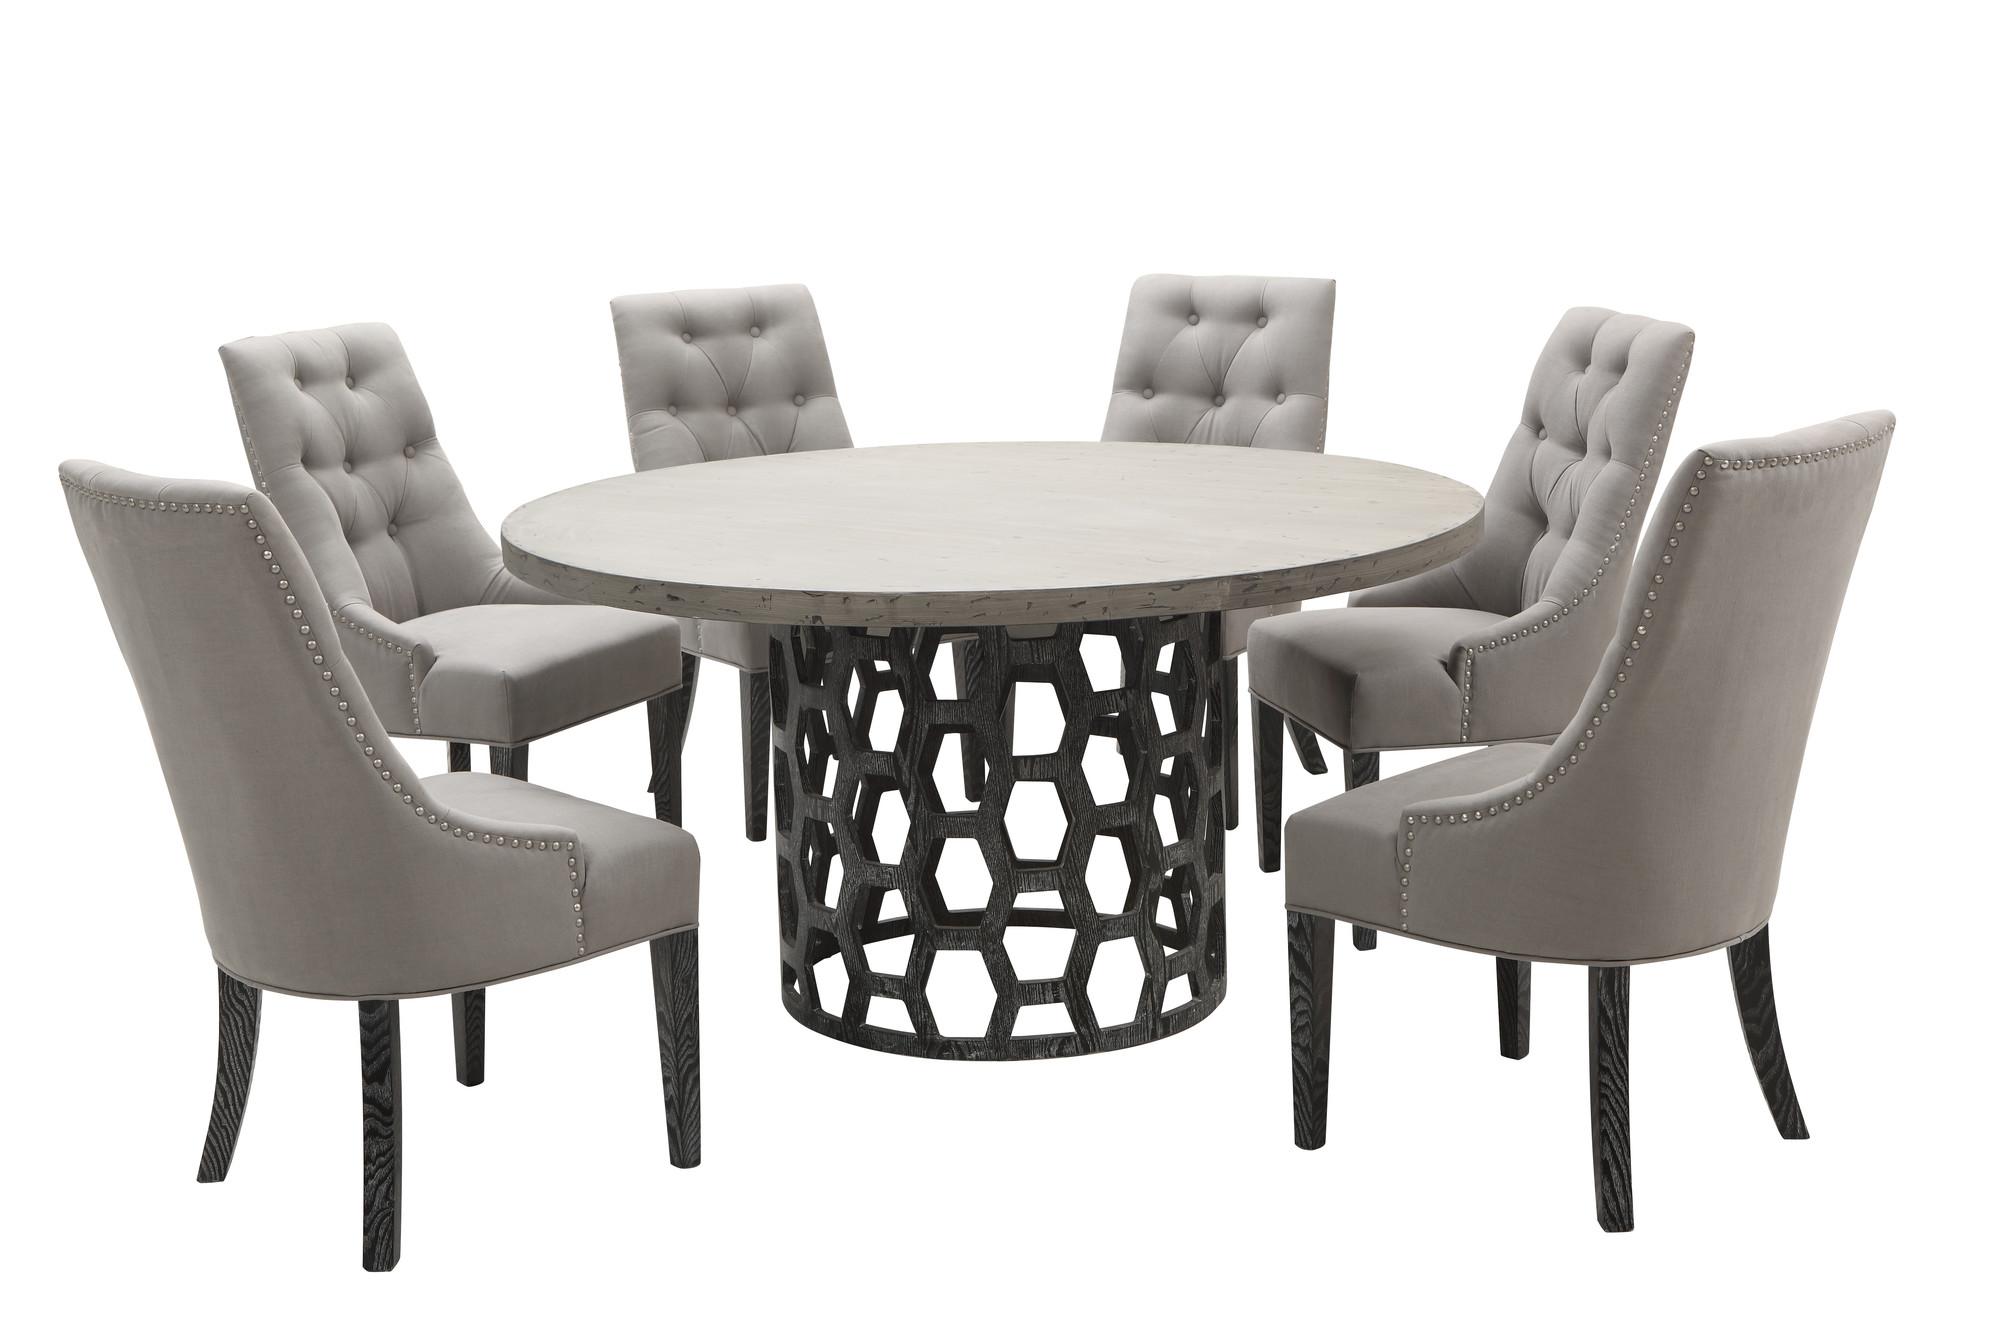 Centennial Round 5pc Dining Table Set Las Vegas Furniture Store Modern Ho